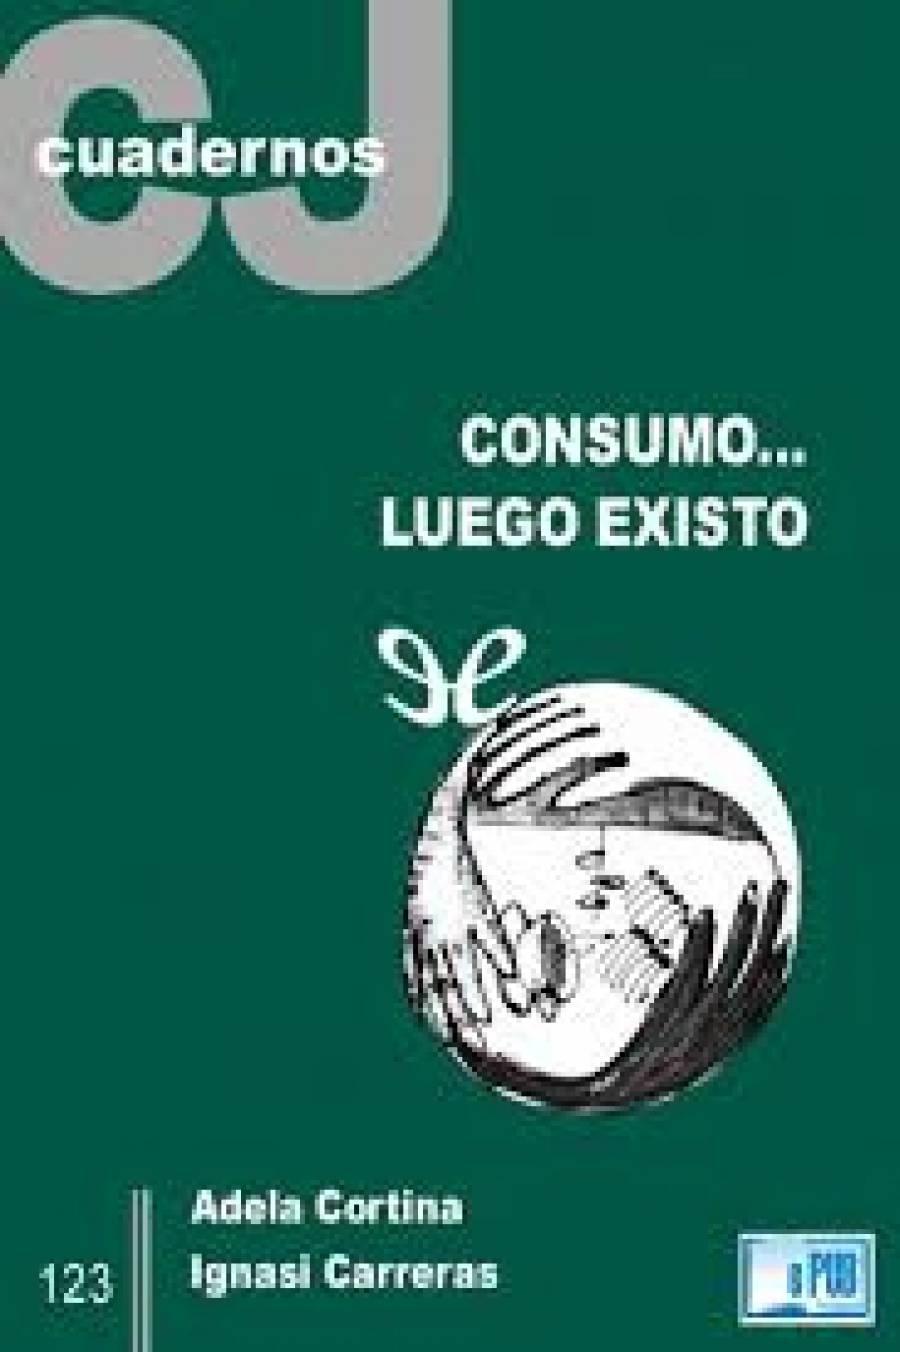 ConsumoEUR Luego Existo PDF Adela Cortina Orts E Ignasi